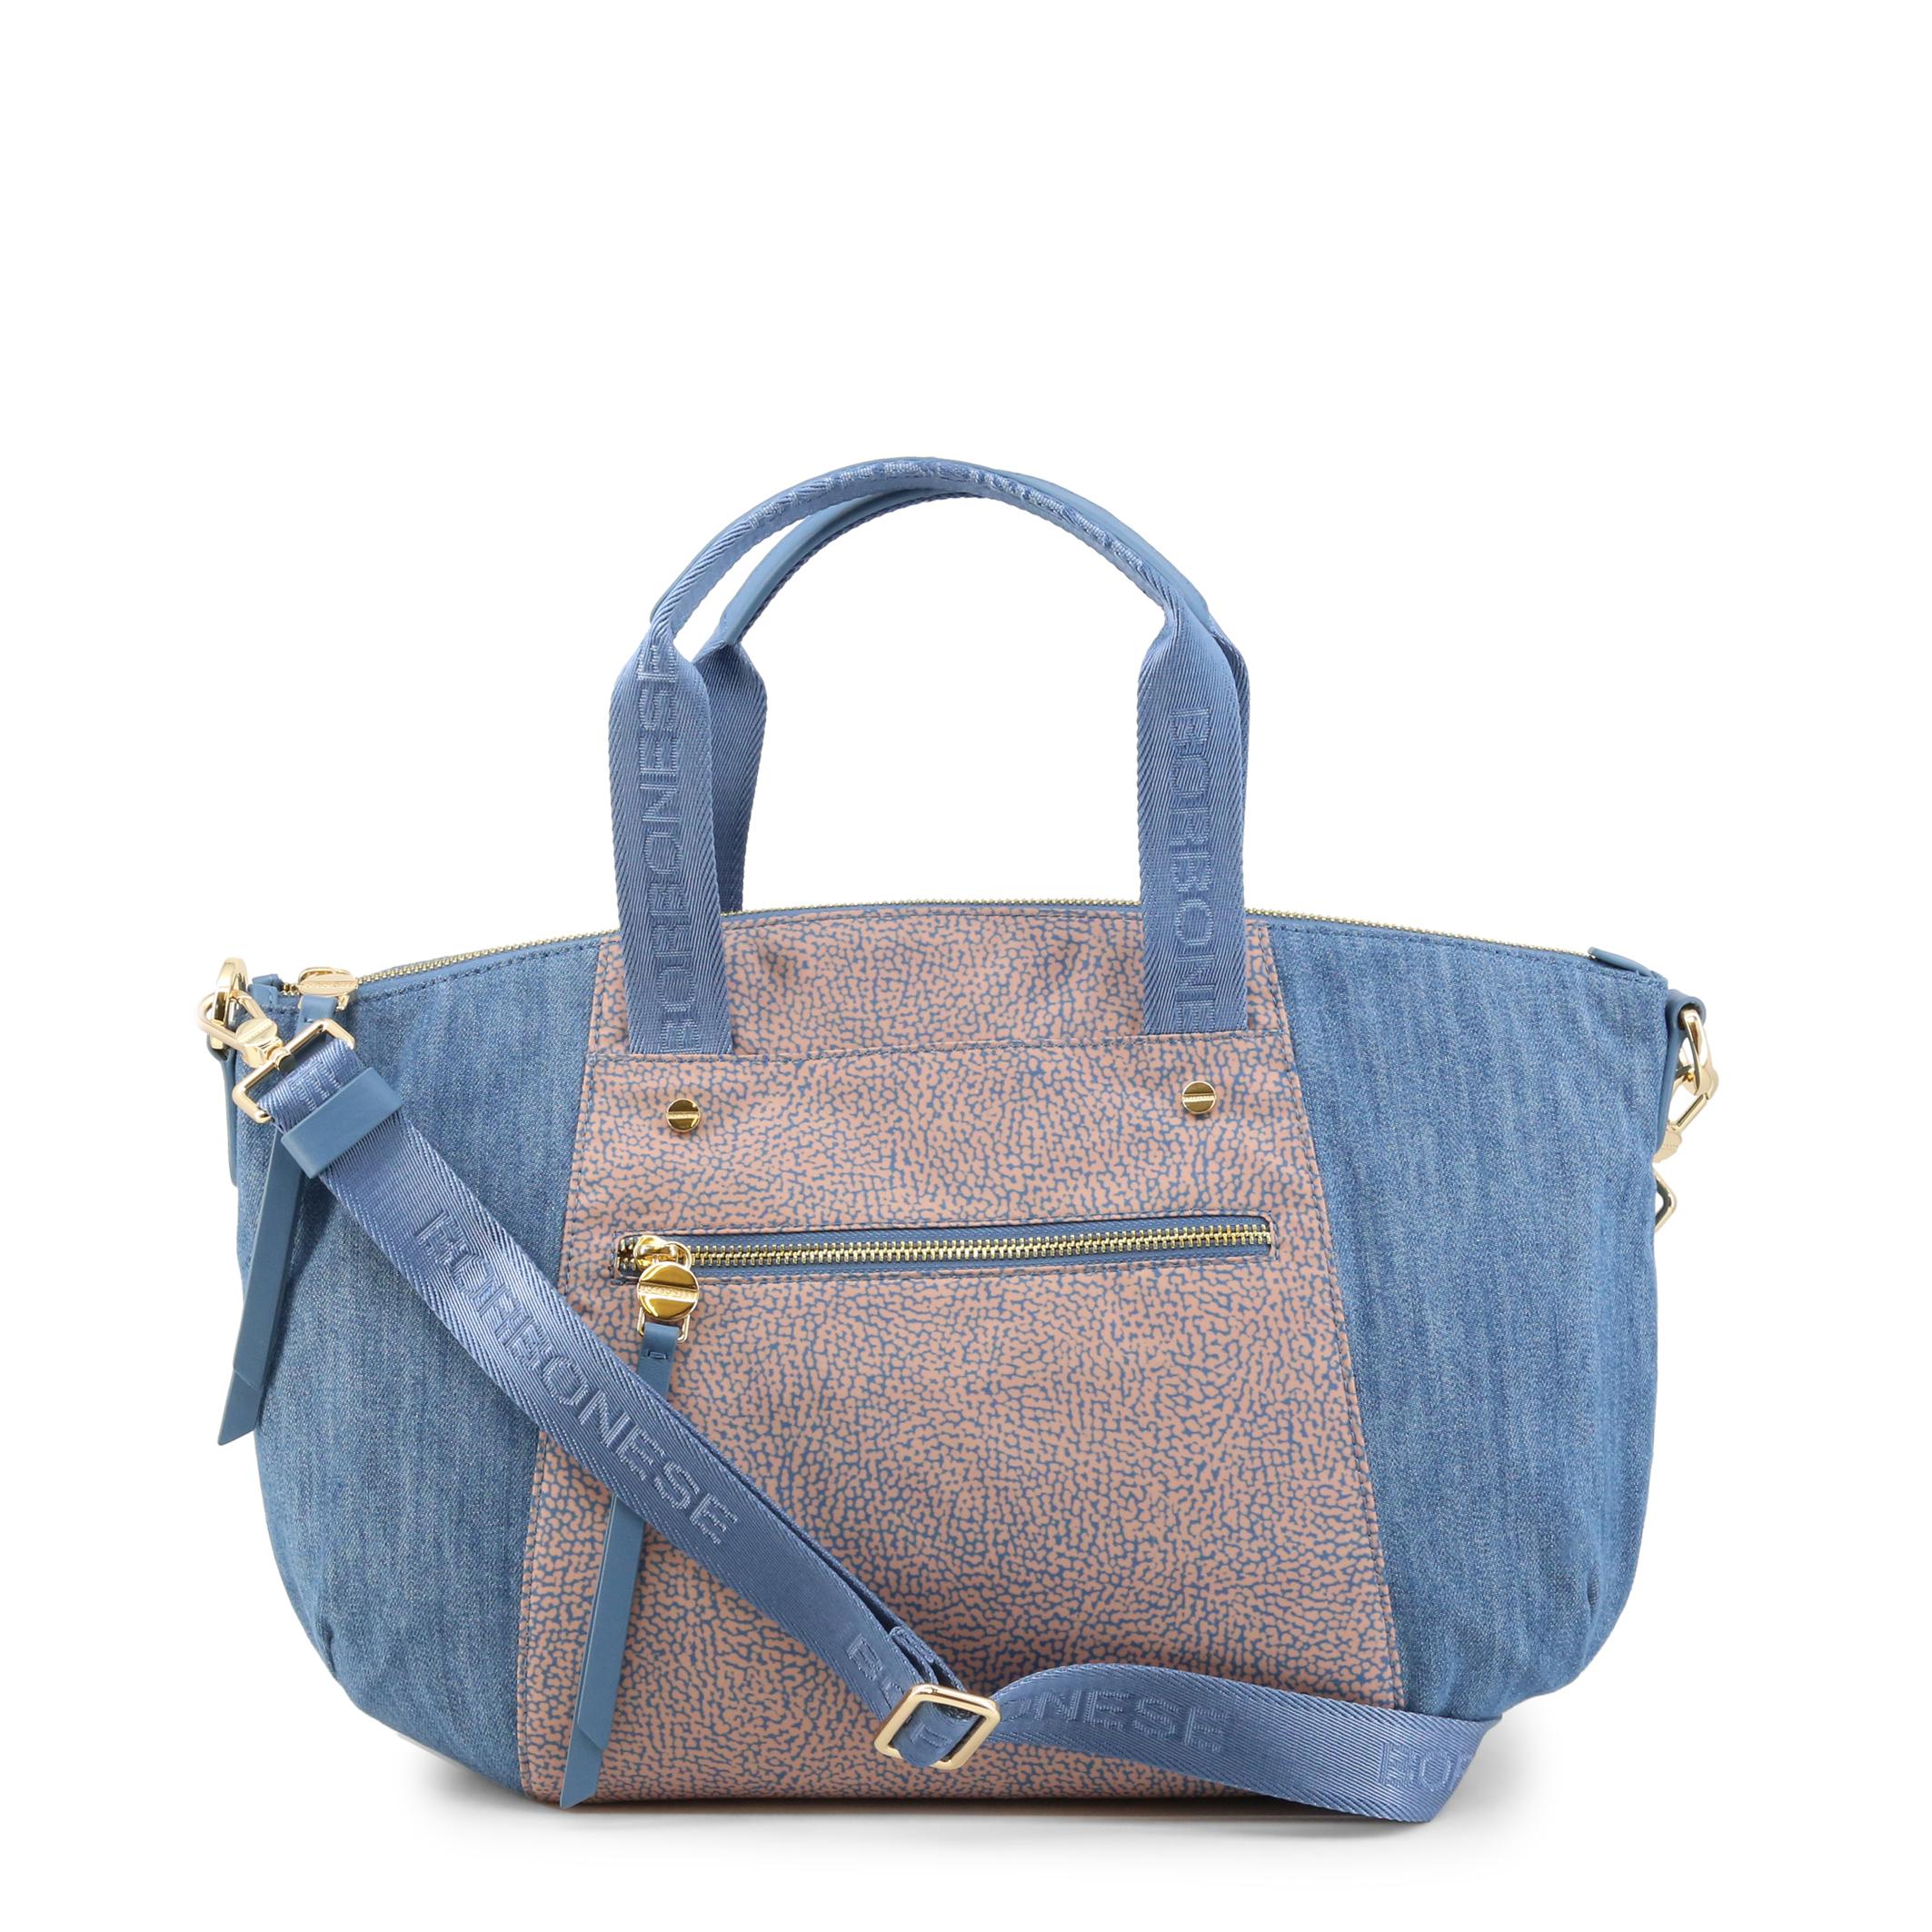 Borbonese - 934285-G44 - Blue